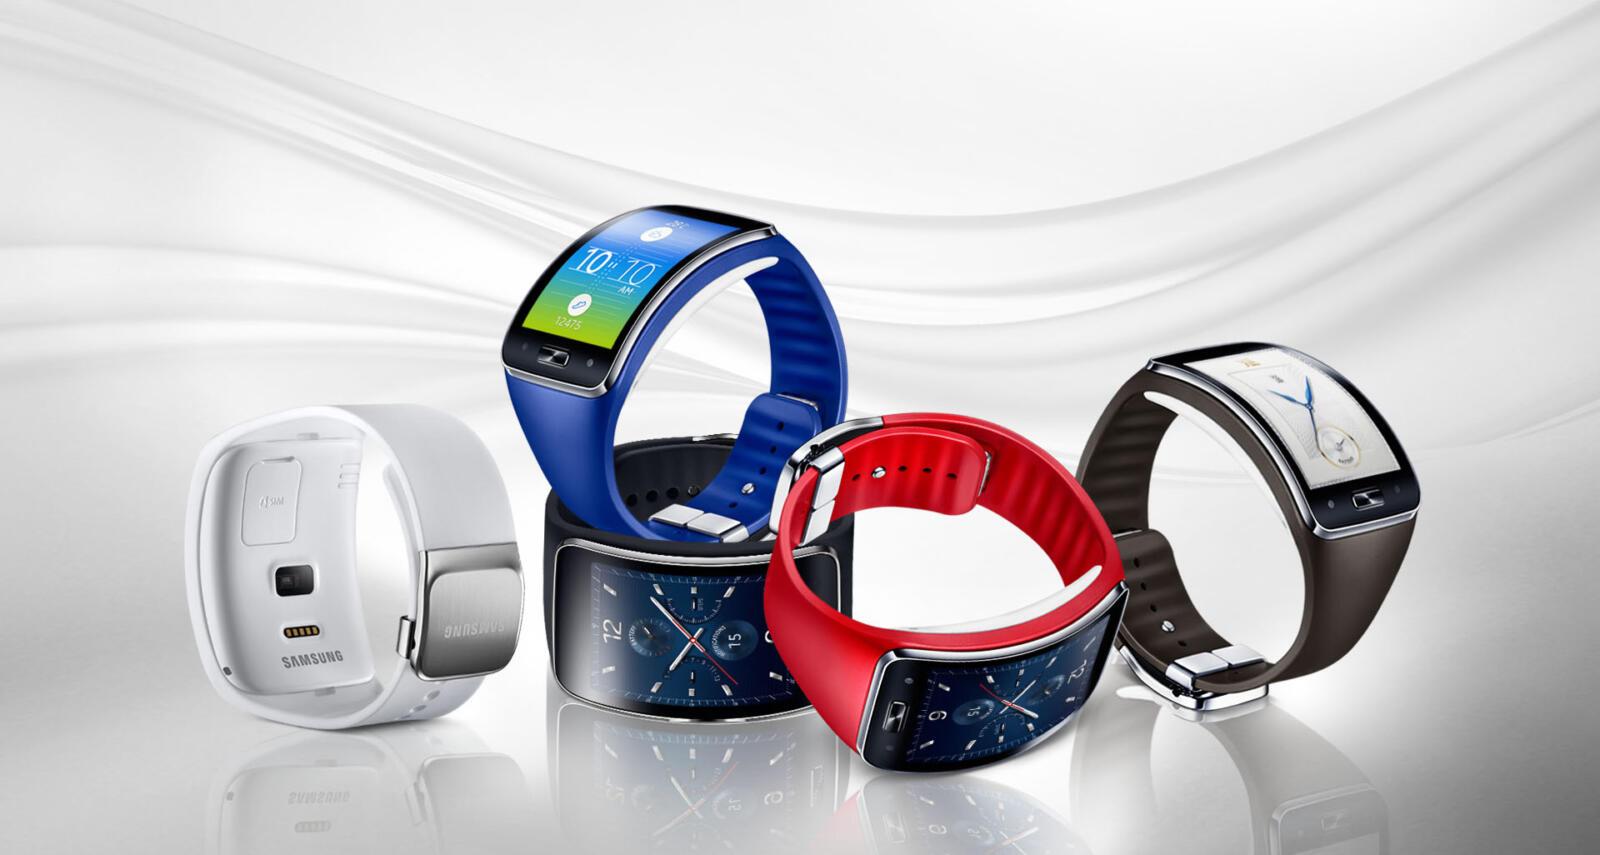 Android gear gear s Samsung tizen